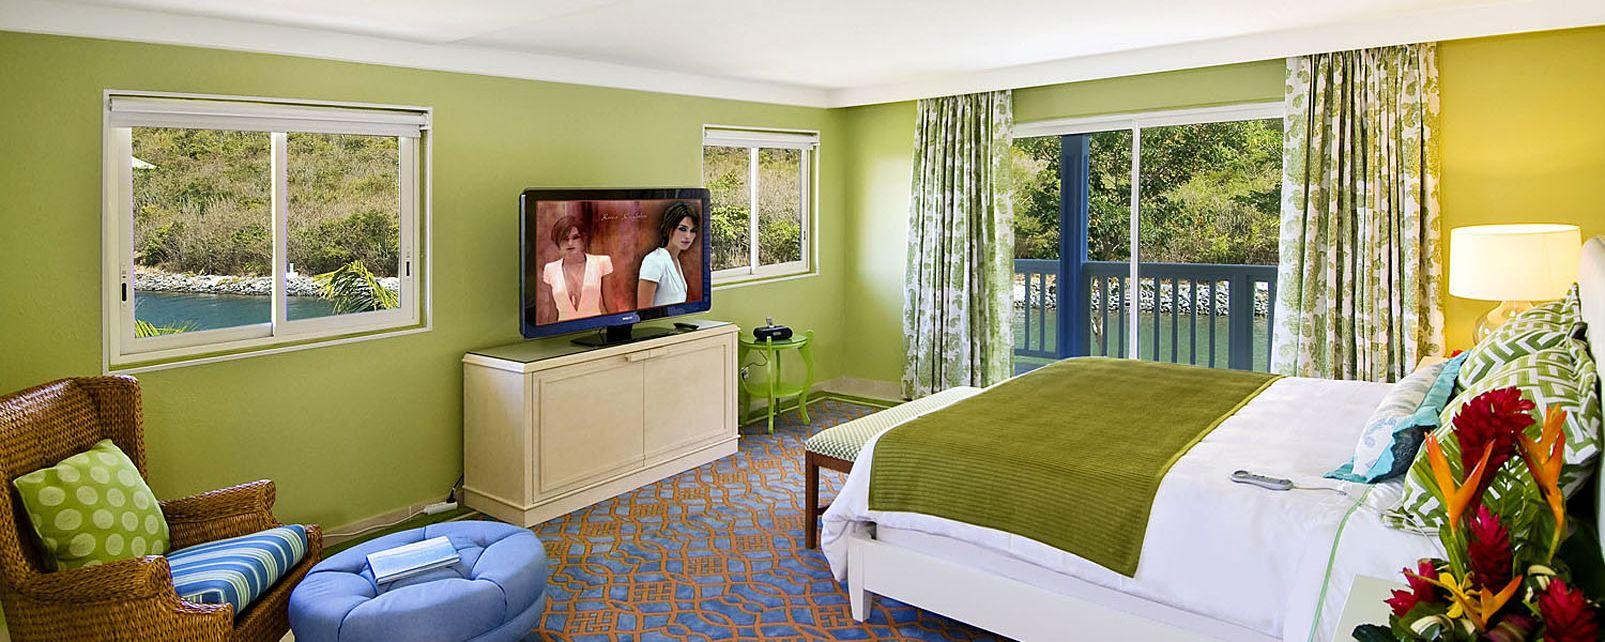 Hôtel Riu Palace Saint Martin Resort